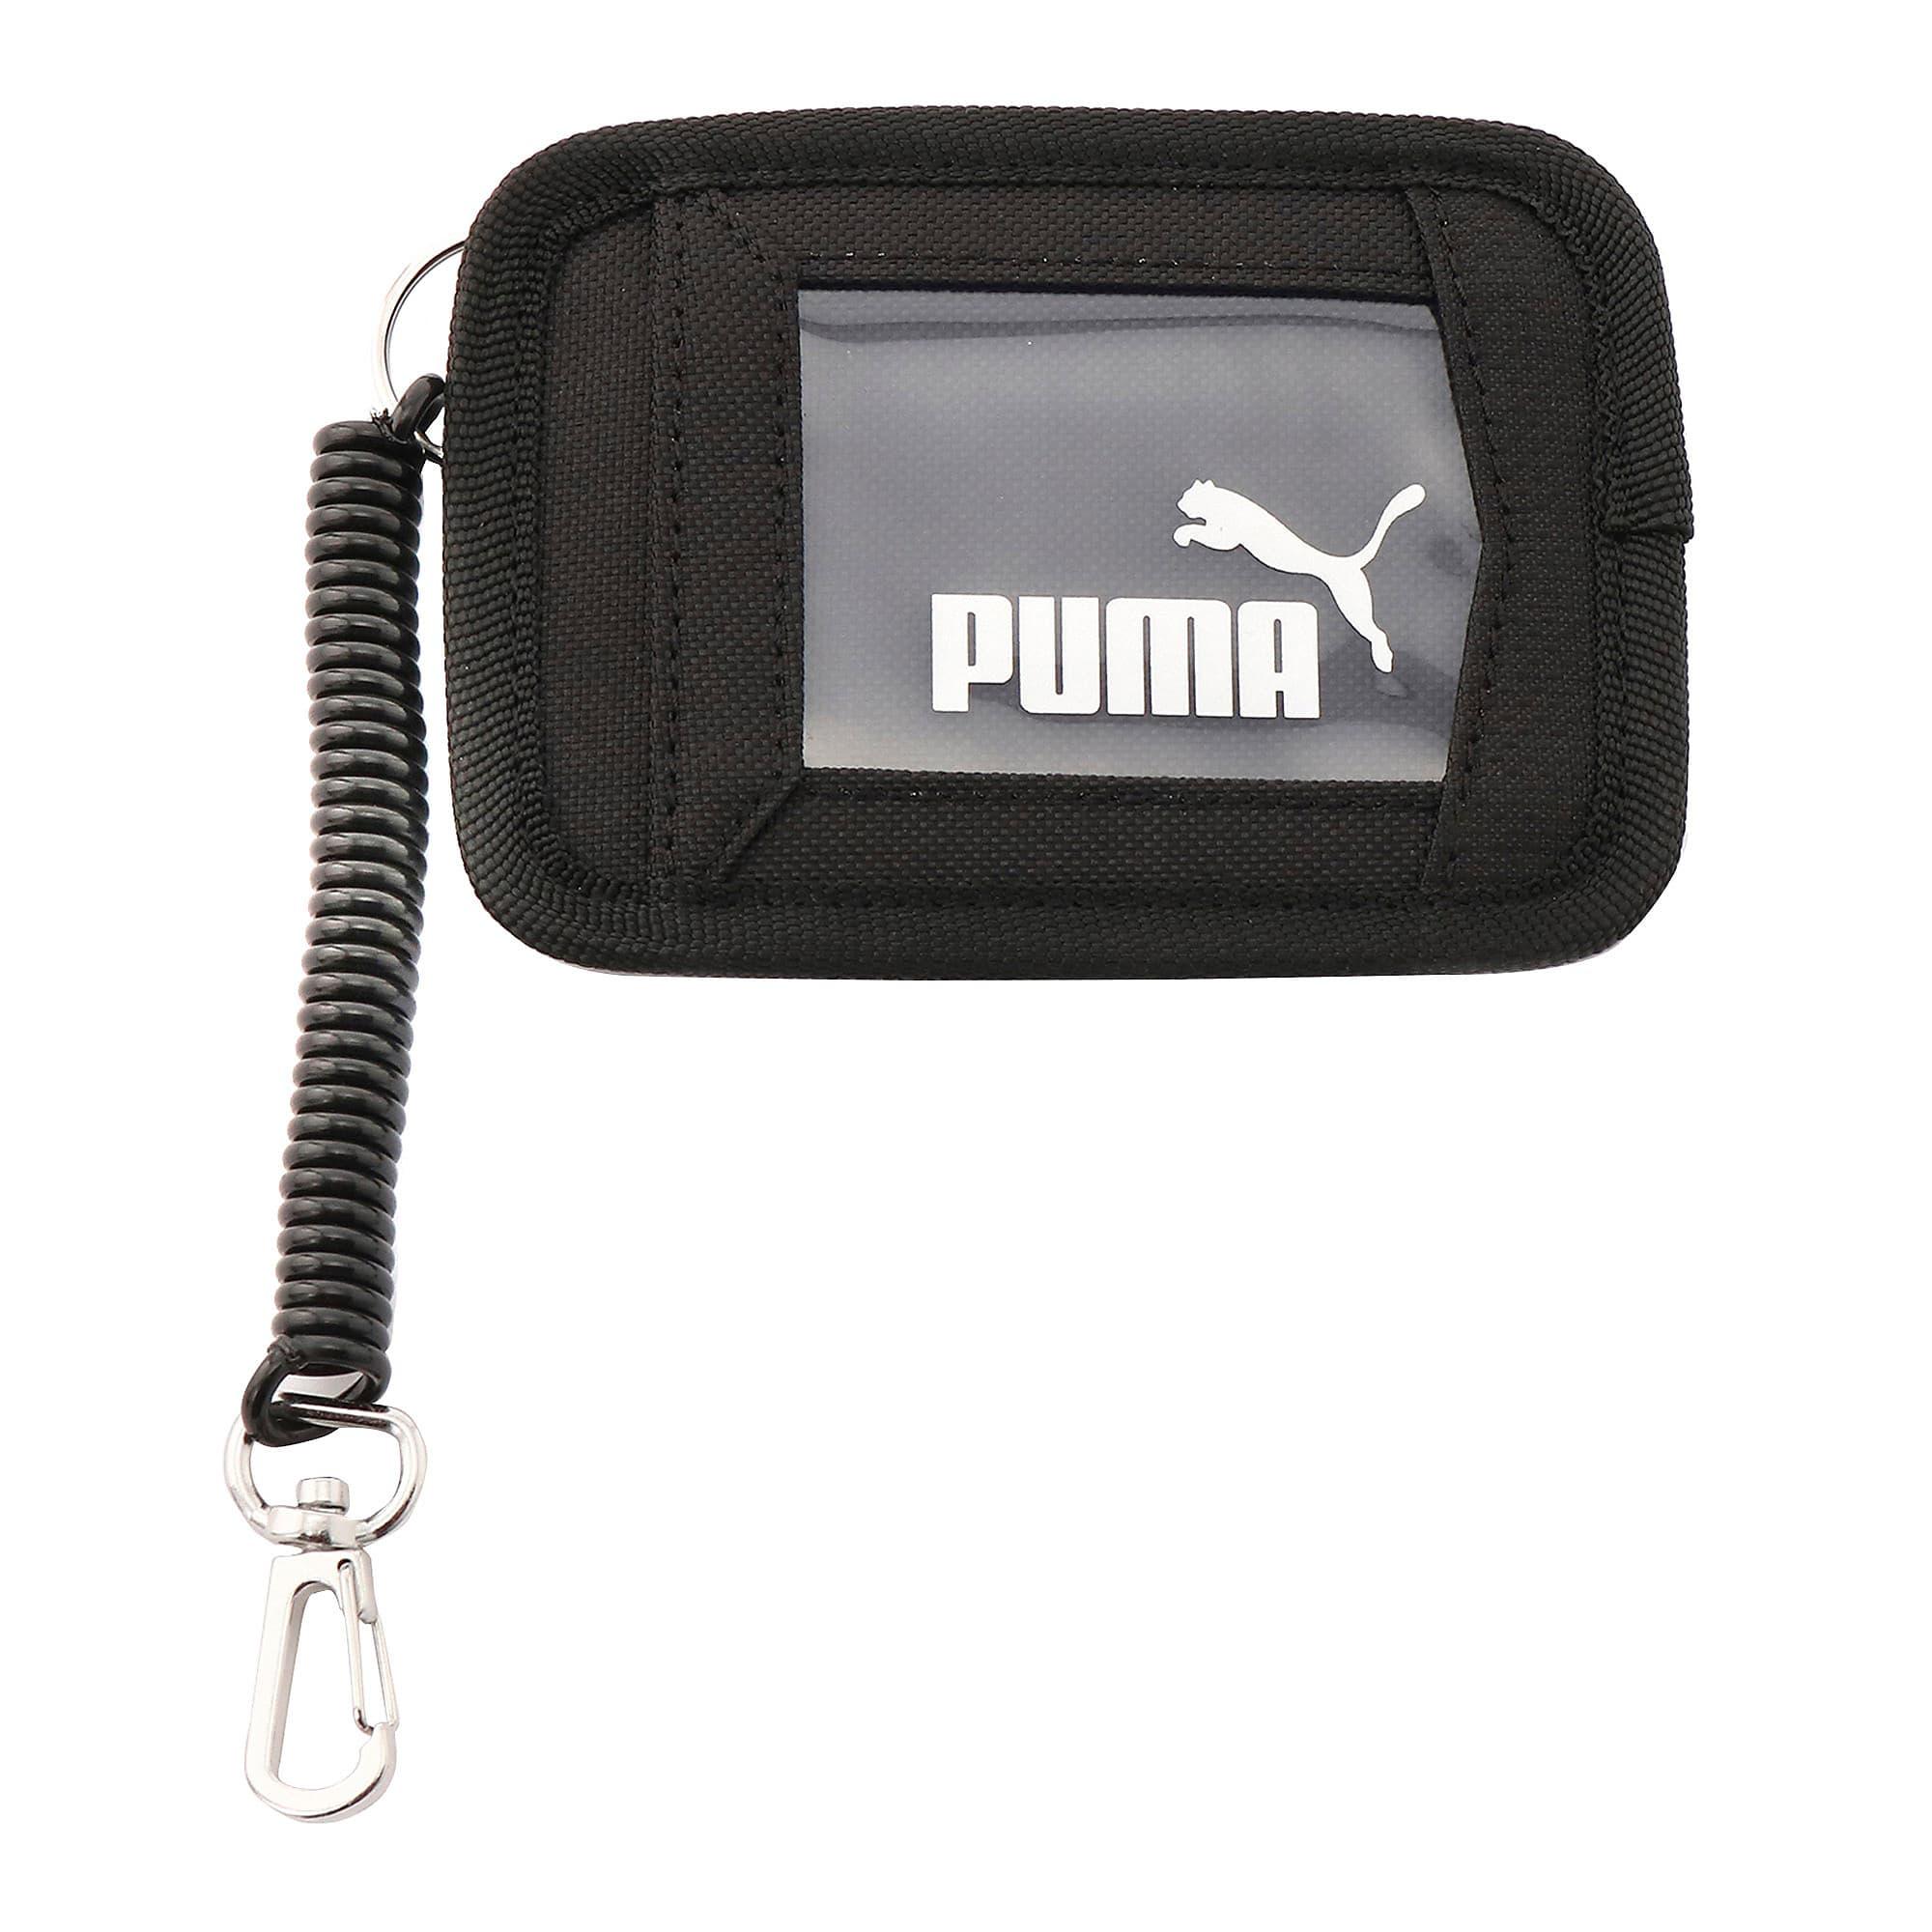 Thumbnail 1 of アクティブ カードホルダー, Puma Black-Silver, medium-JPN